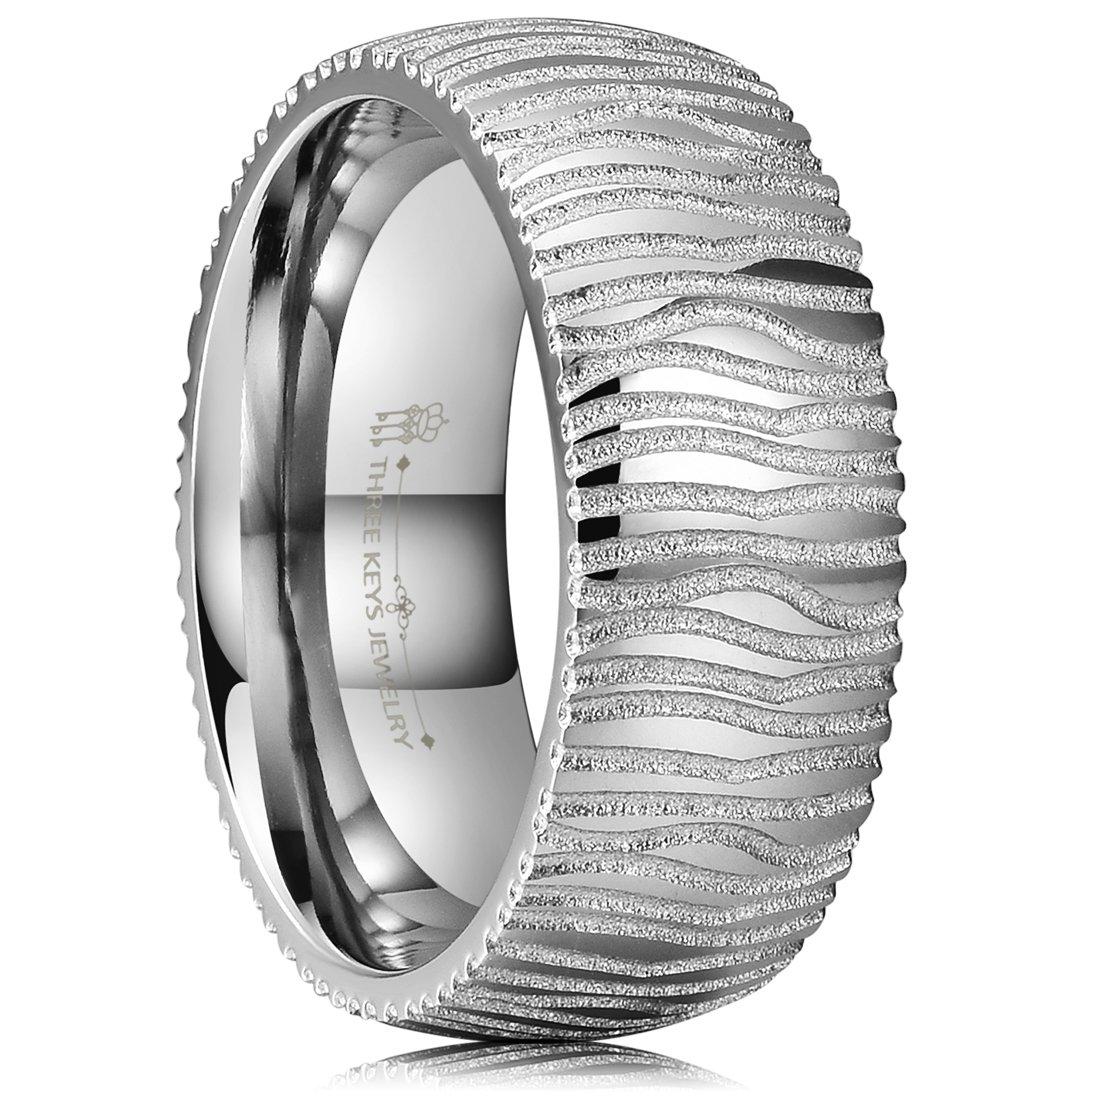 THREE KEYS JEWELRY 8mm Koa Wood Bubinga Ebony Inlay Damascus Steel Mens Wedding Ring Black Gold Band